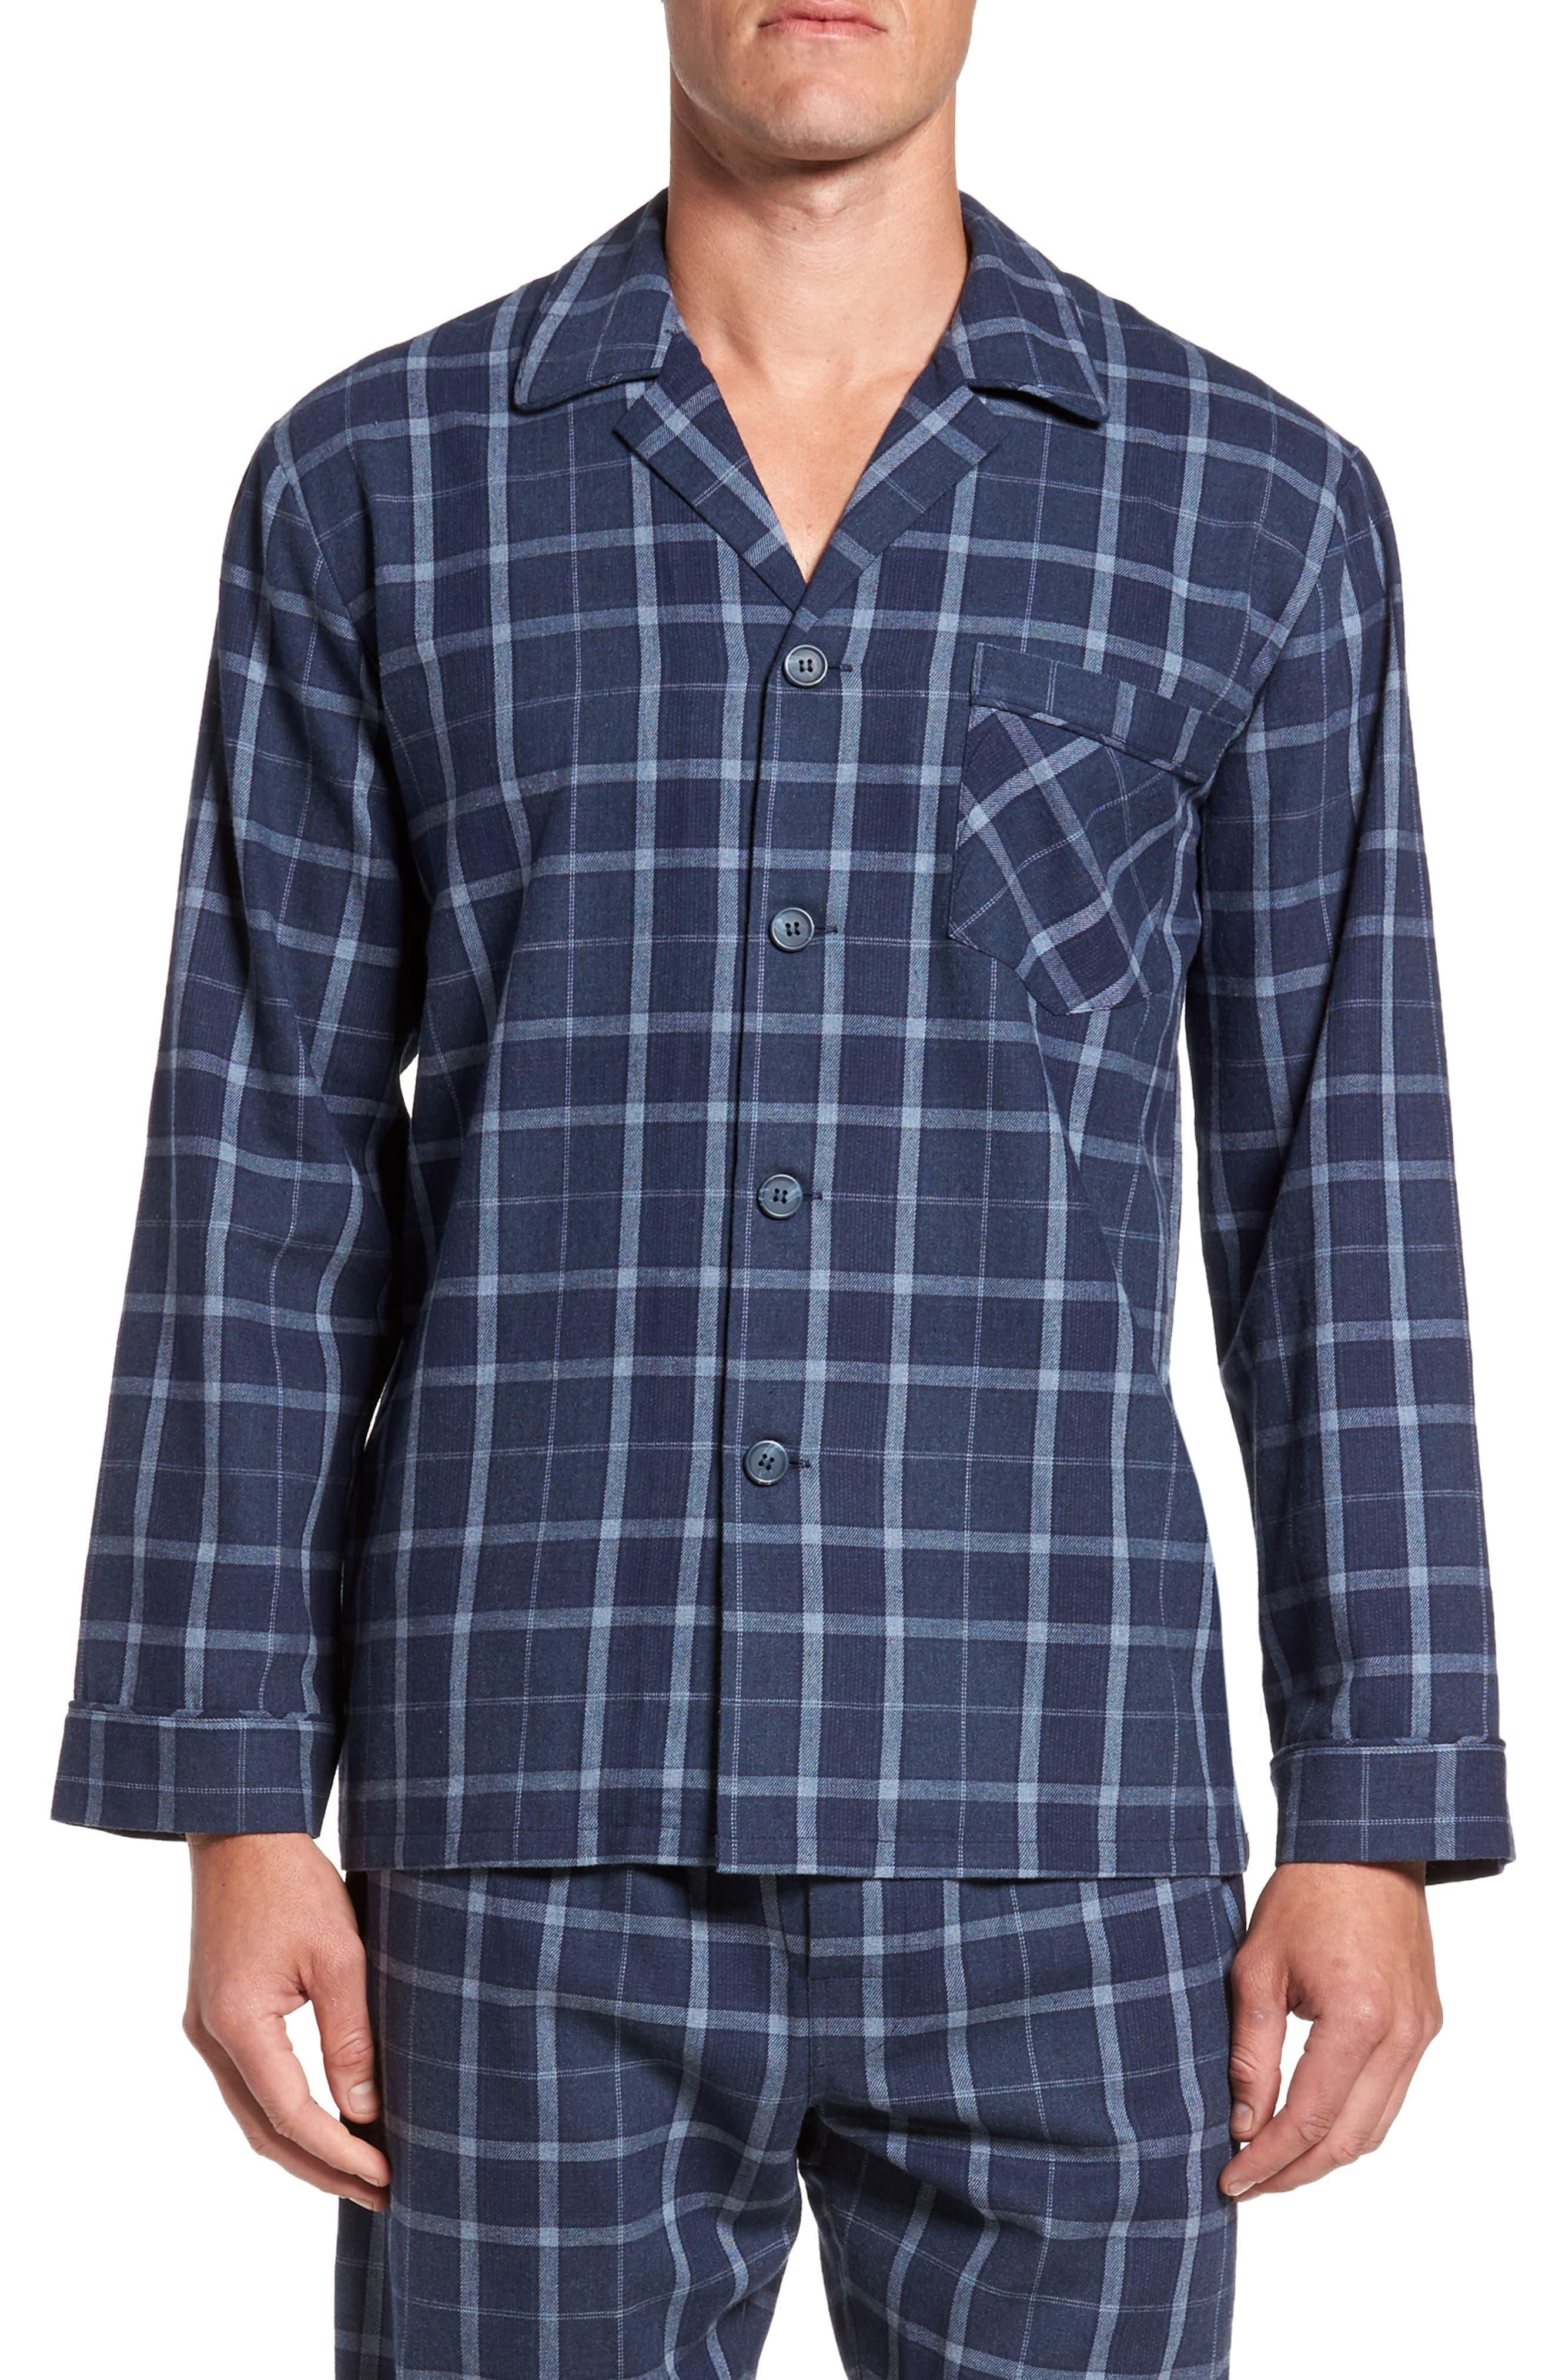 Guiness Plaid Pajama Set,                             Alternate thumbnail 5, color,                             400